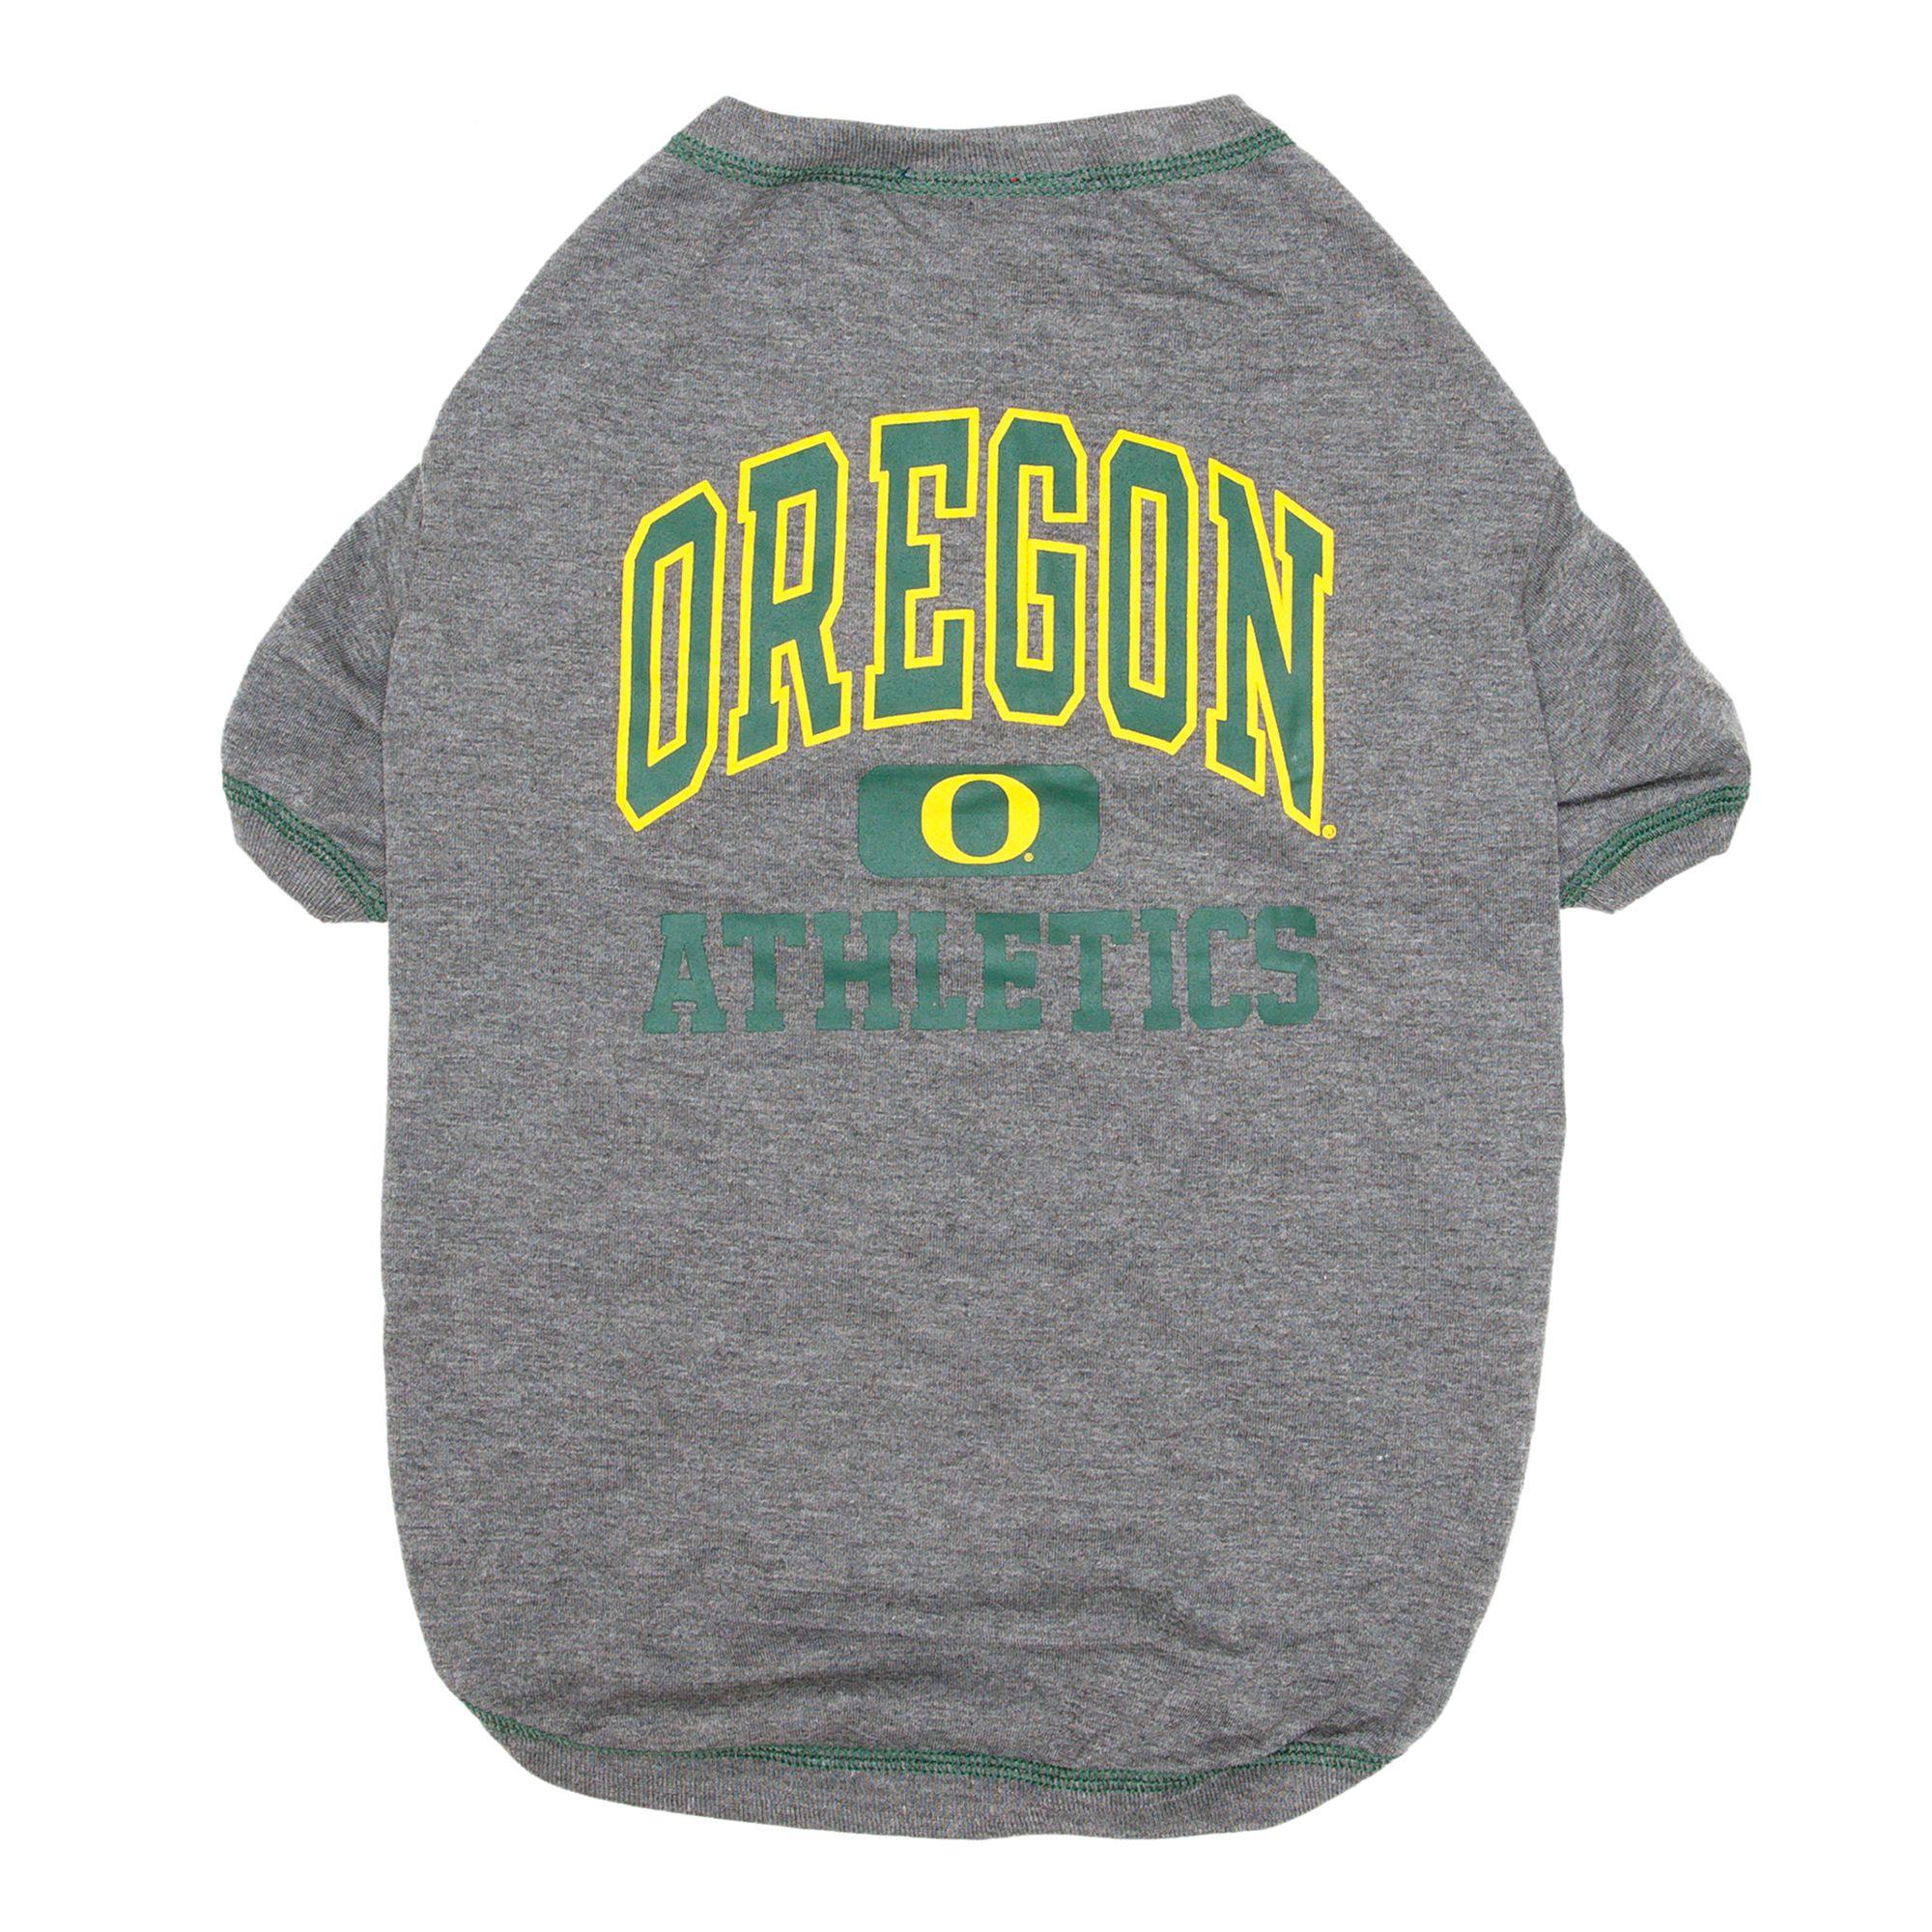 University of Oregon Ducks Ncaa Team Tee size: Large, Pets First 5259168